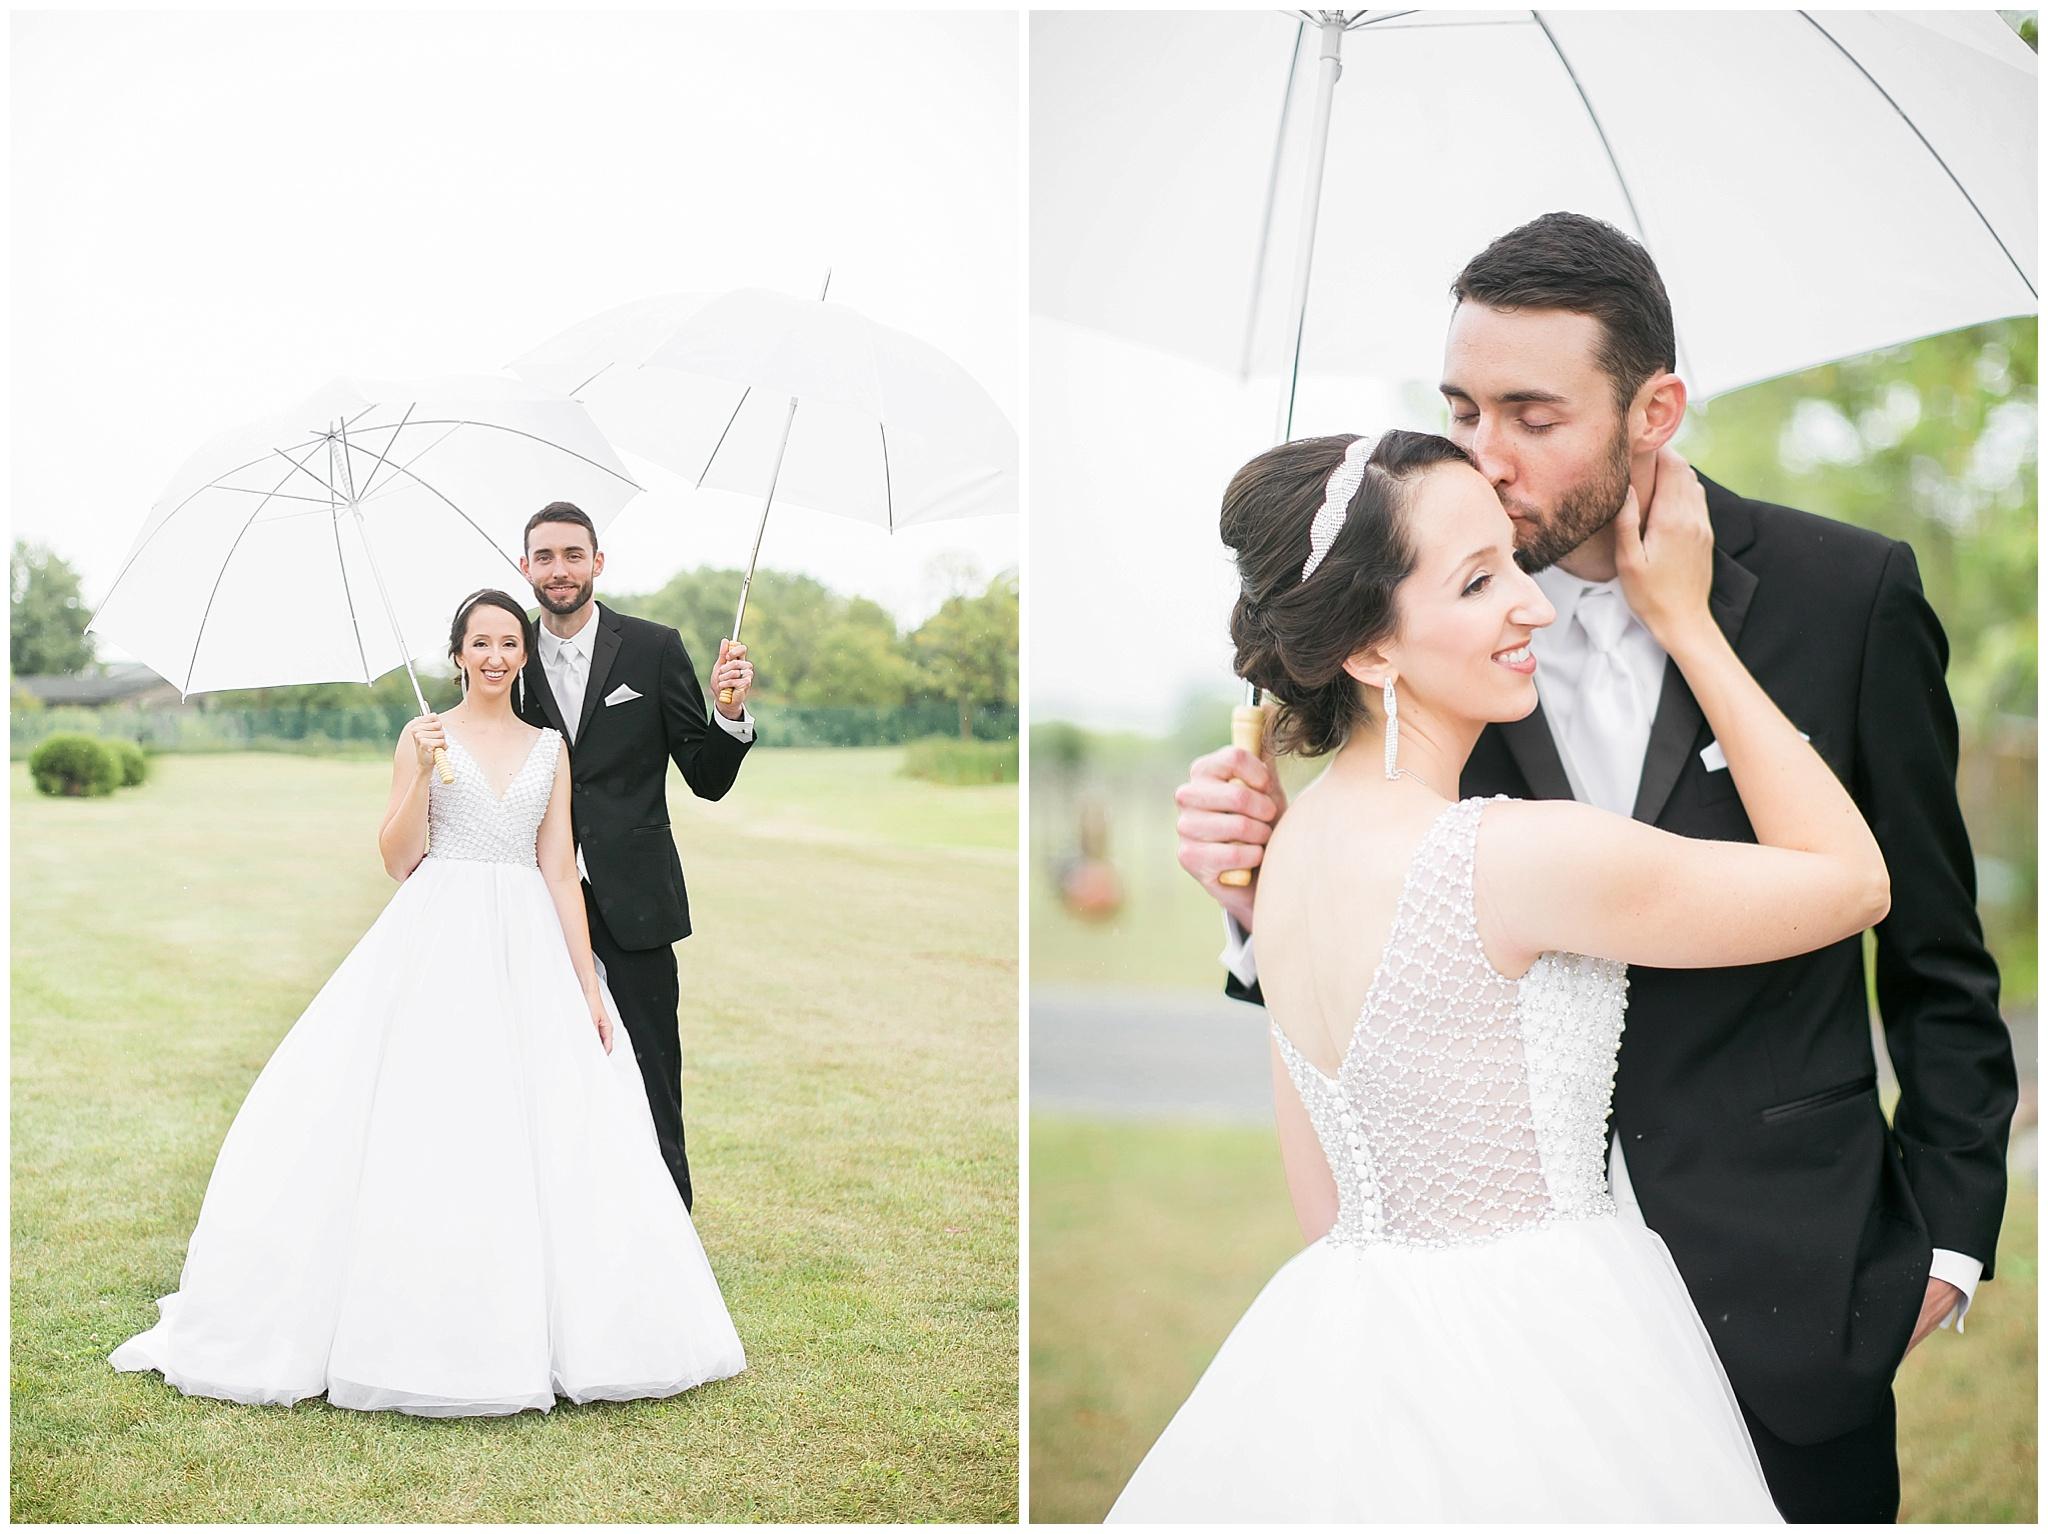 bridgewood_resort_wedding_neenah_wisconsin_0335.jpg